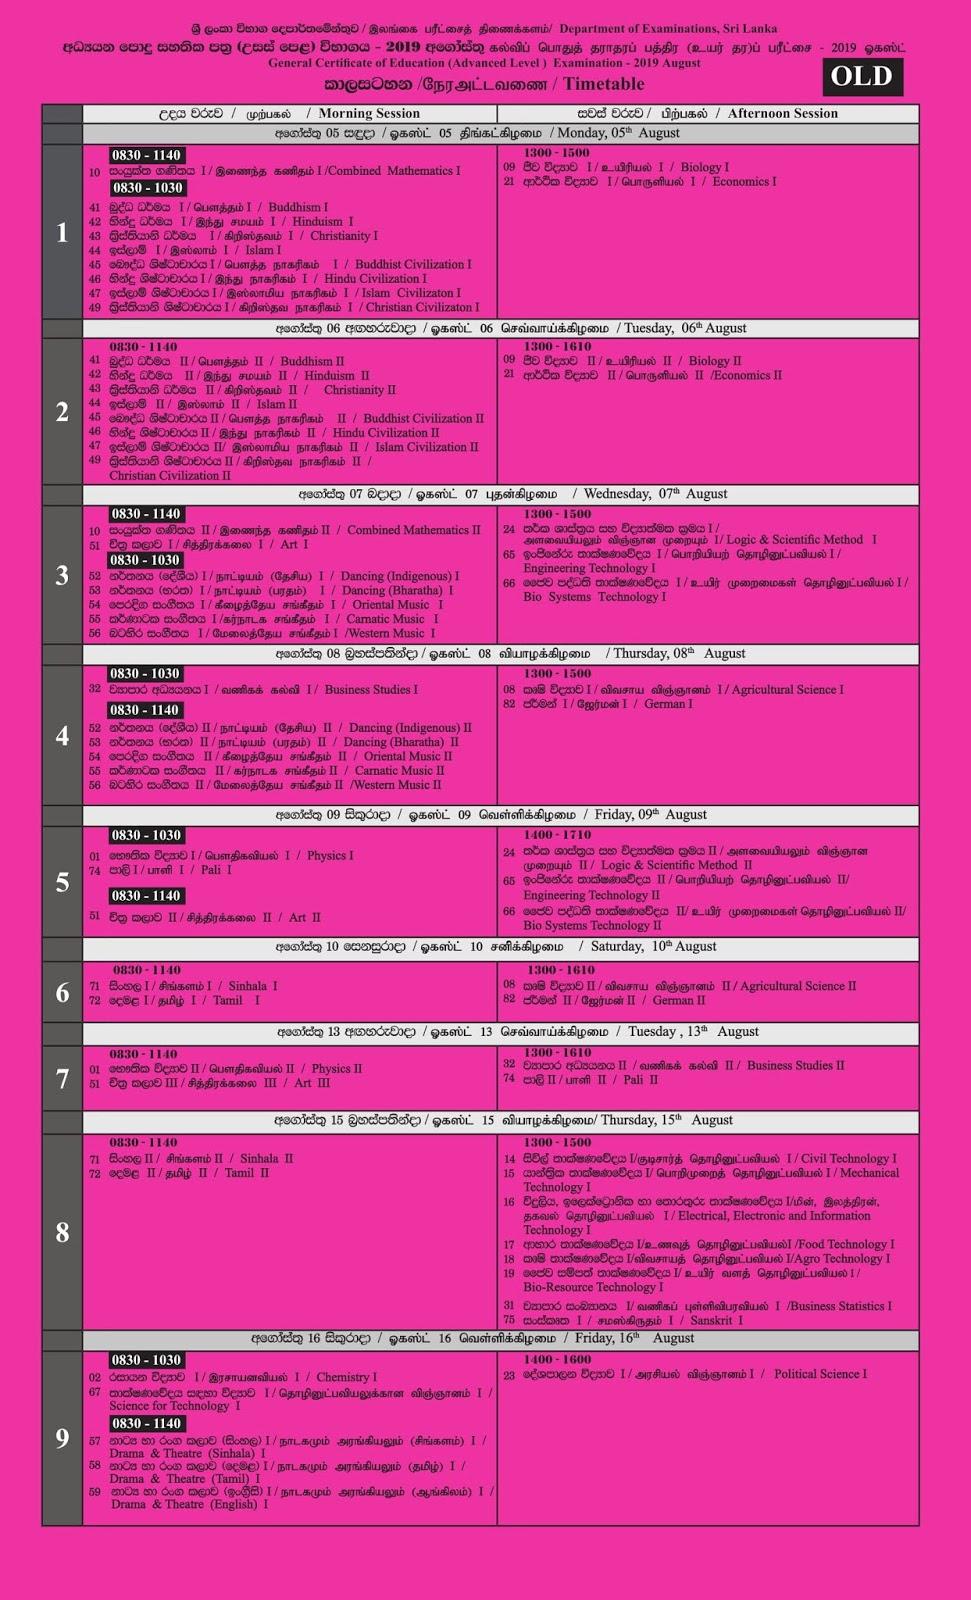 Advanced Level Timetable 2019 | New Syllabus | Old Syllabus